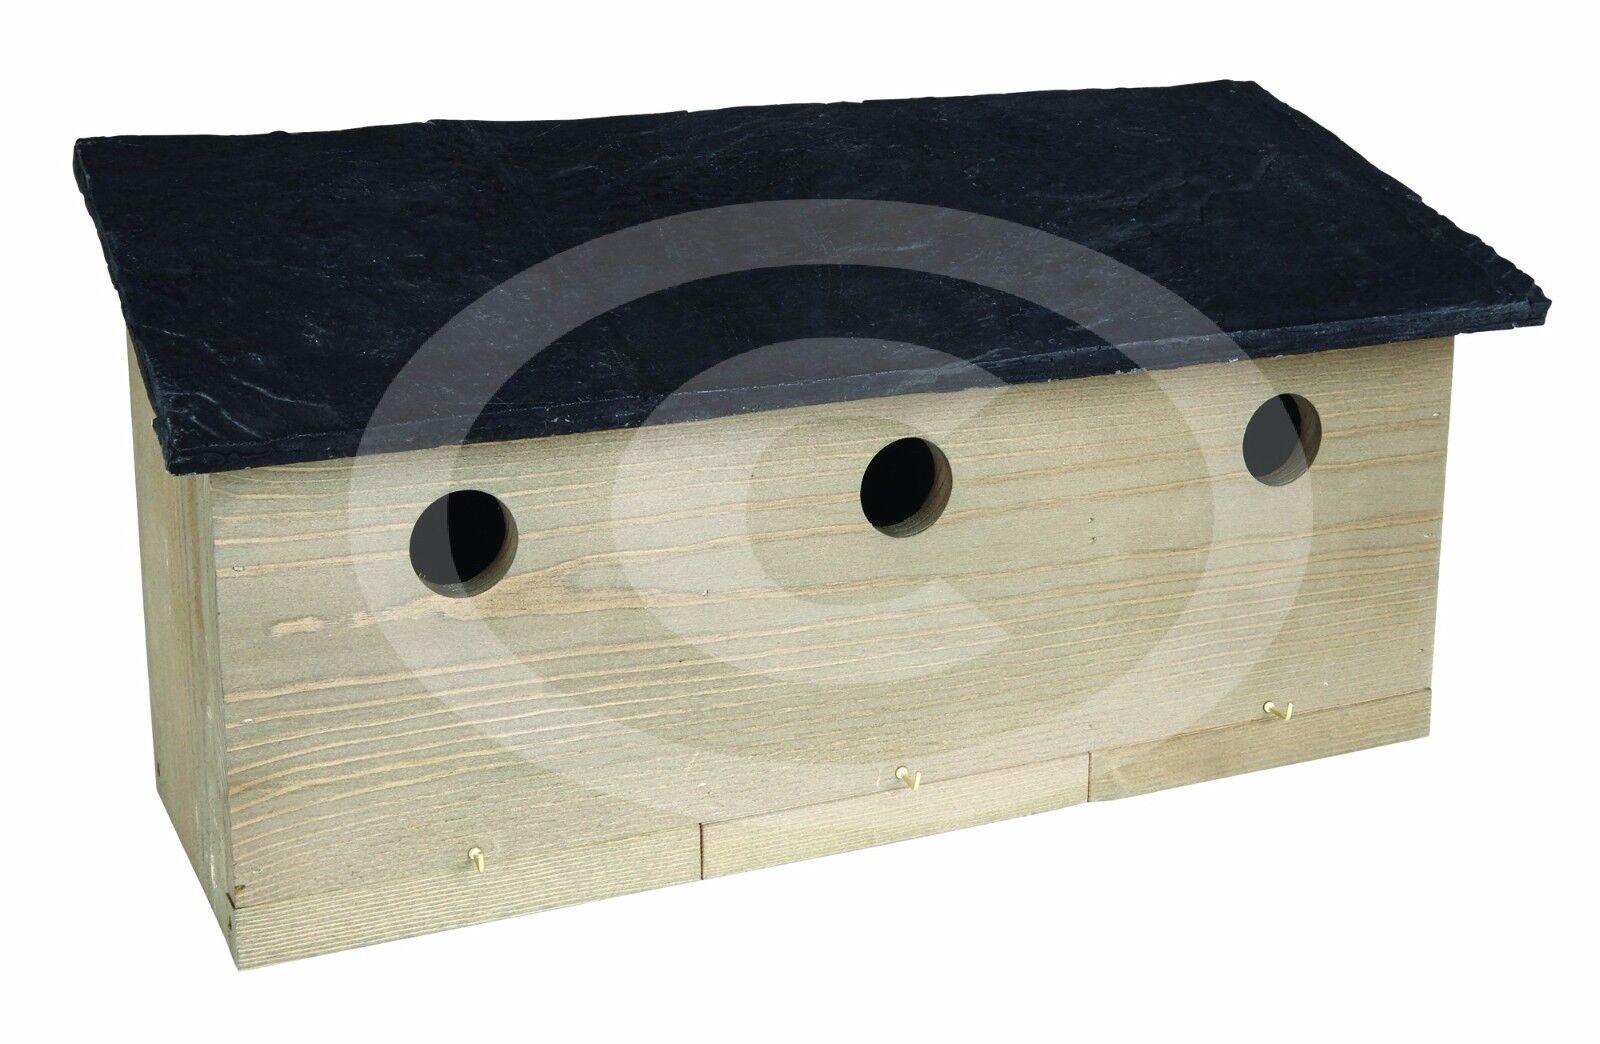 Norfolk Sparrow Nest Box for Wild Bids Multi Hole Entrance 21.5cm Height Gardman